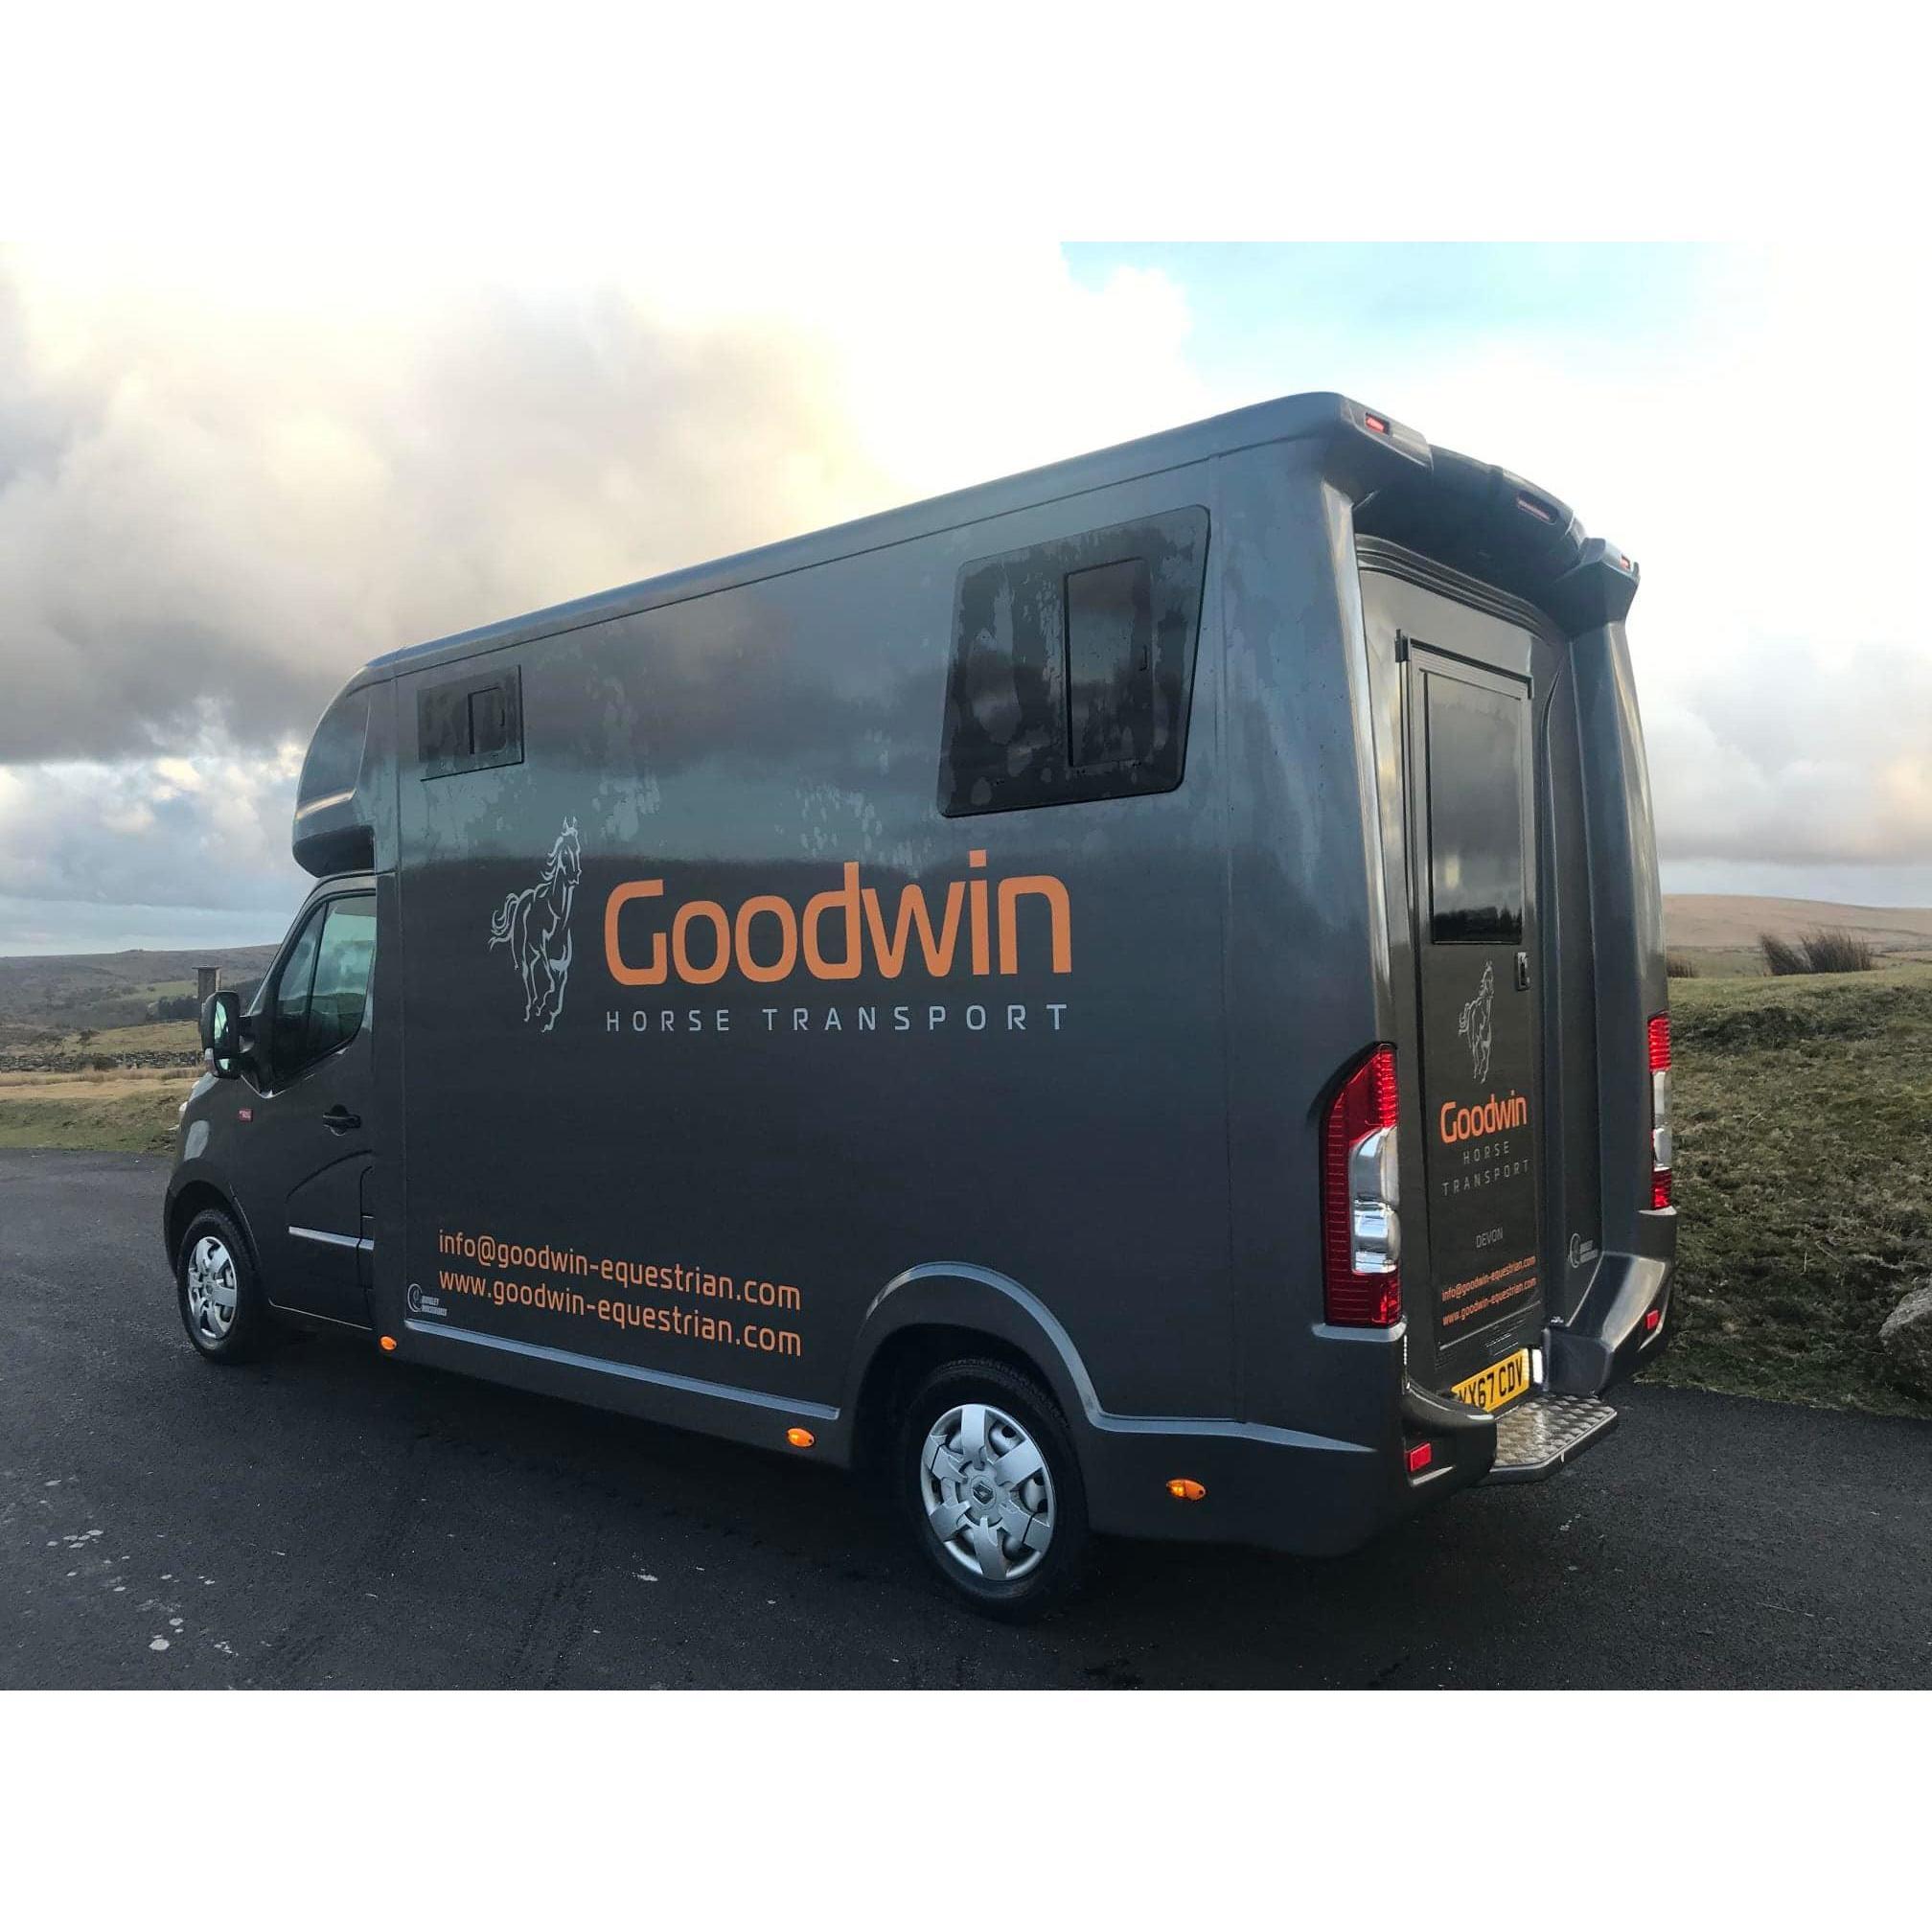 Goodwin Horse Transport - Newton Abbot, Devon TQ13 8NN - 01647 441352 | ShowMeLocal.com